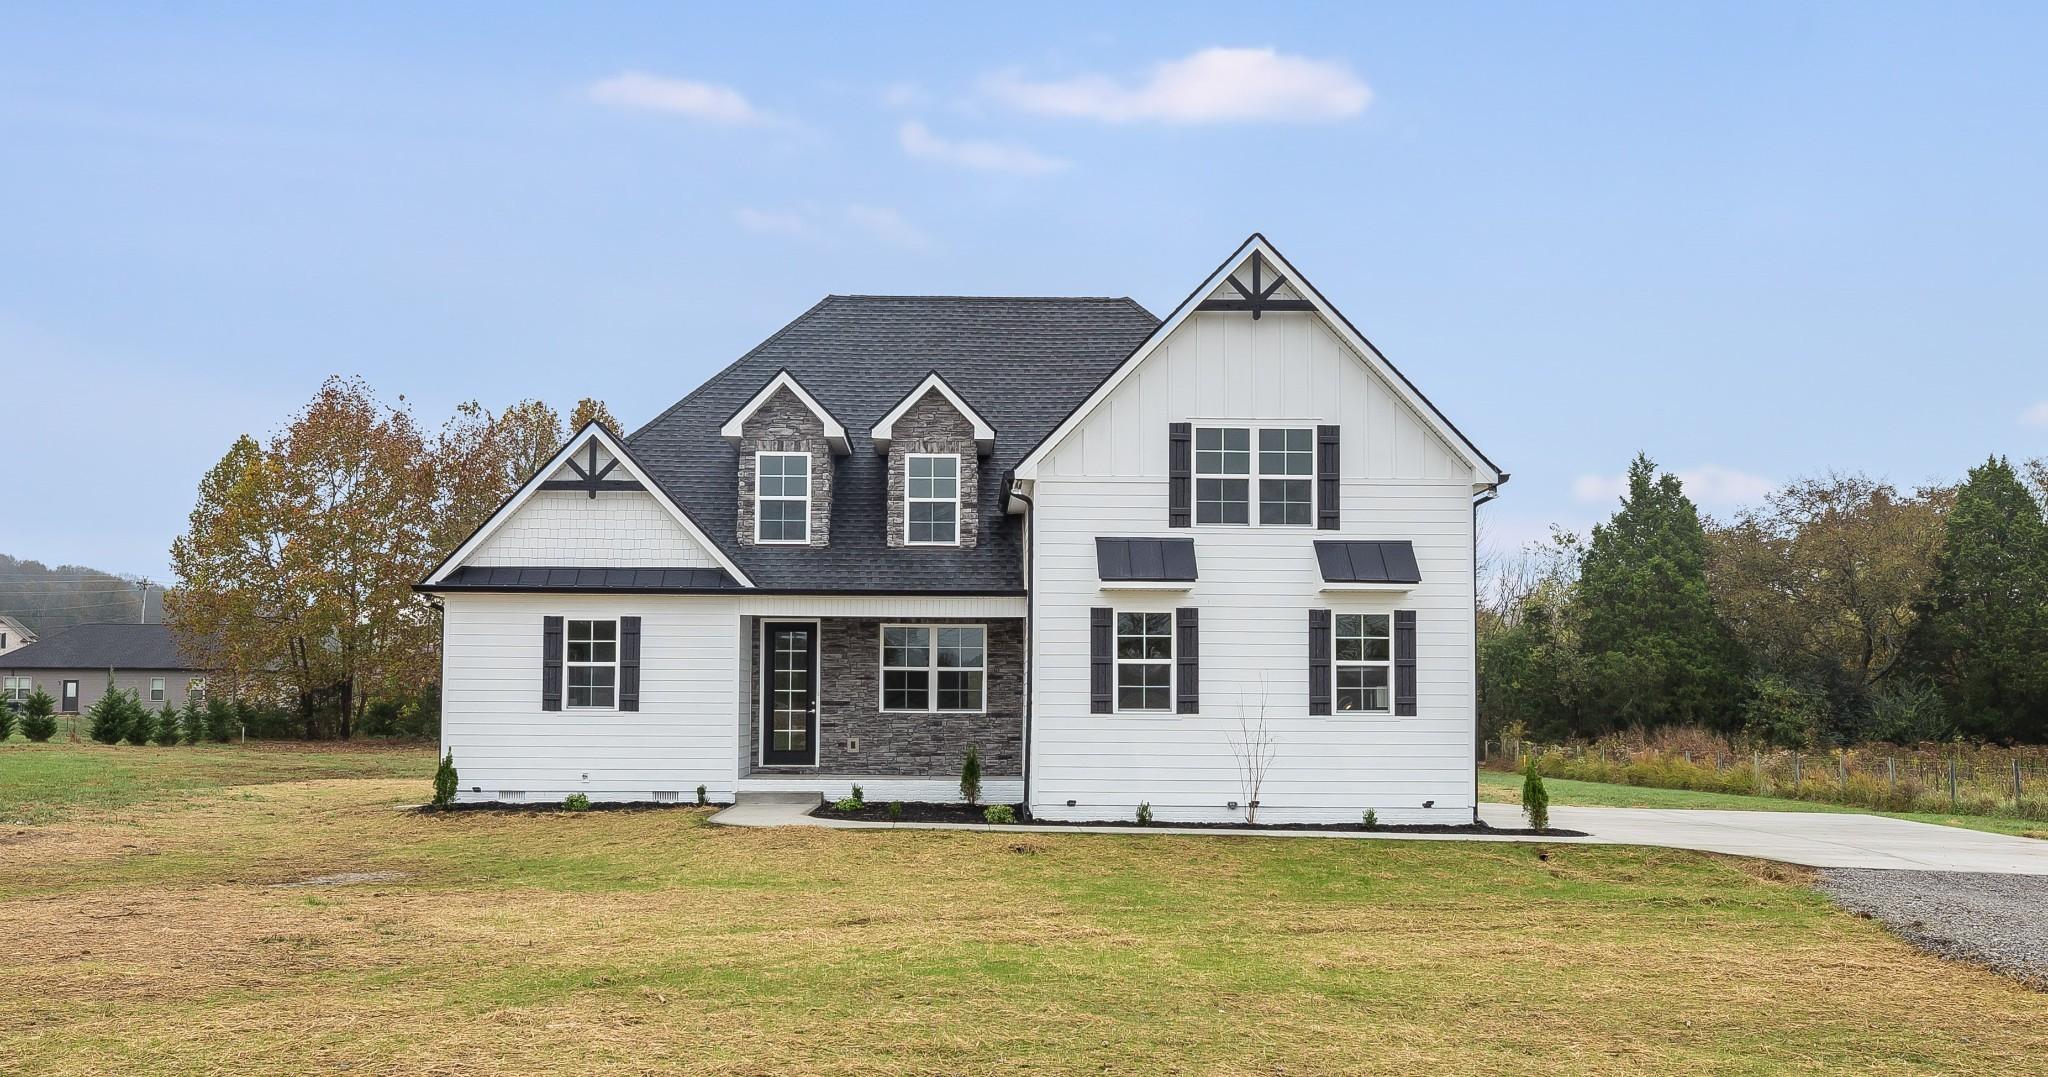 6540 Murfreesboro Rd, Lebanon, TN 37090 - Lebanon, TN real estate listing